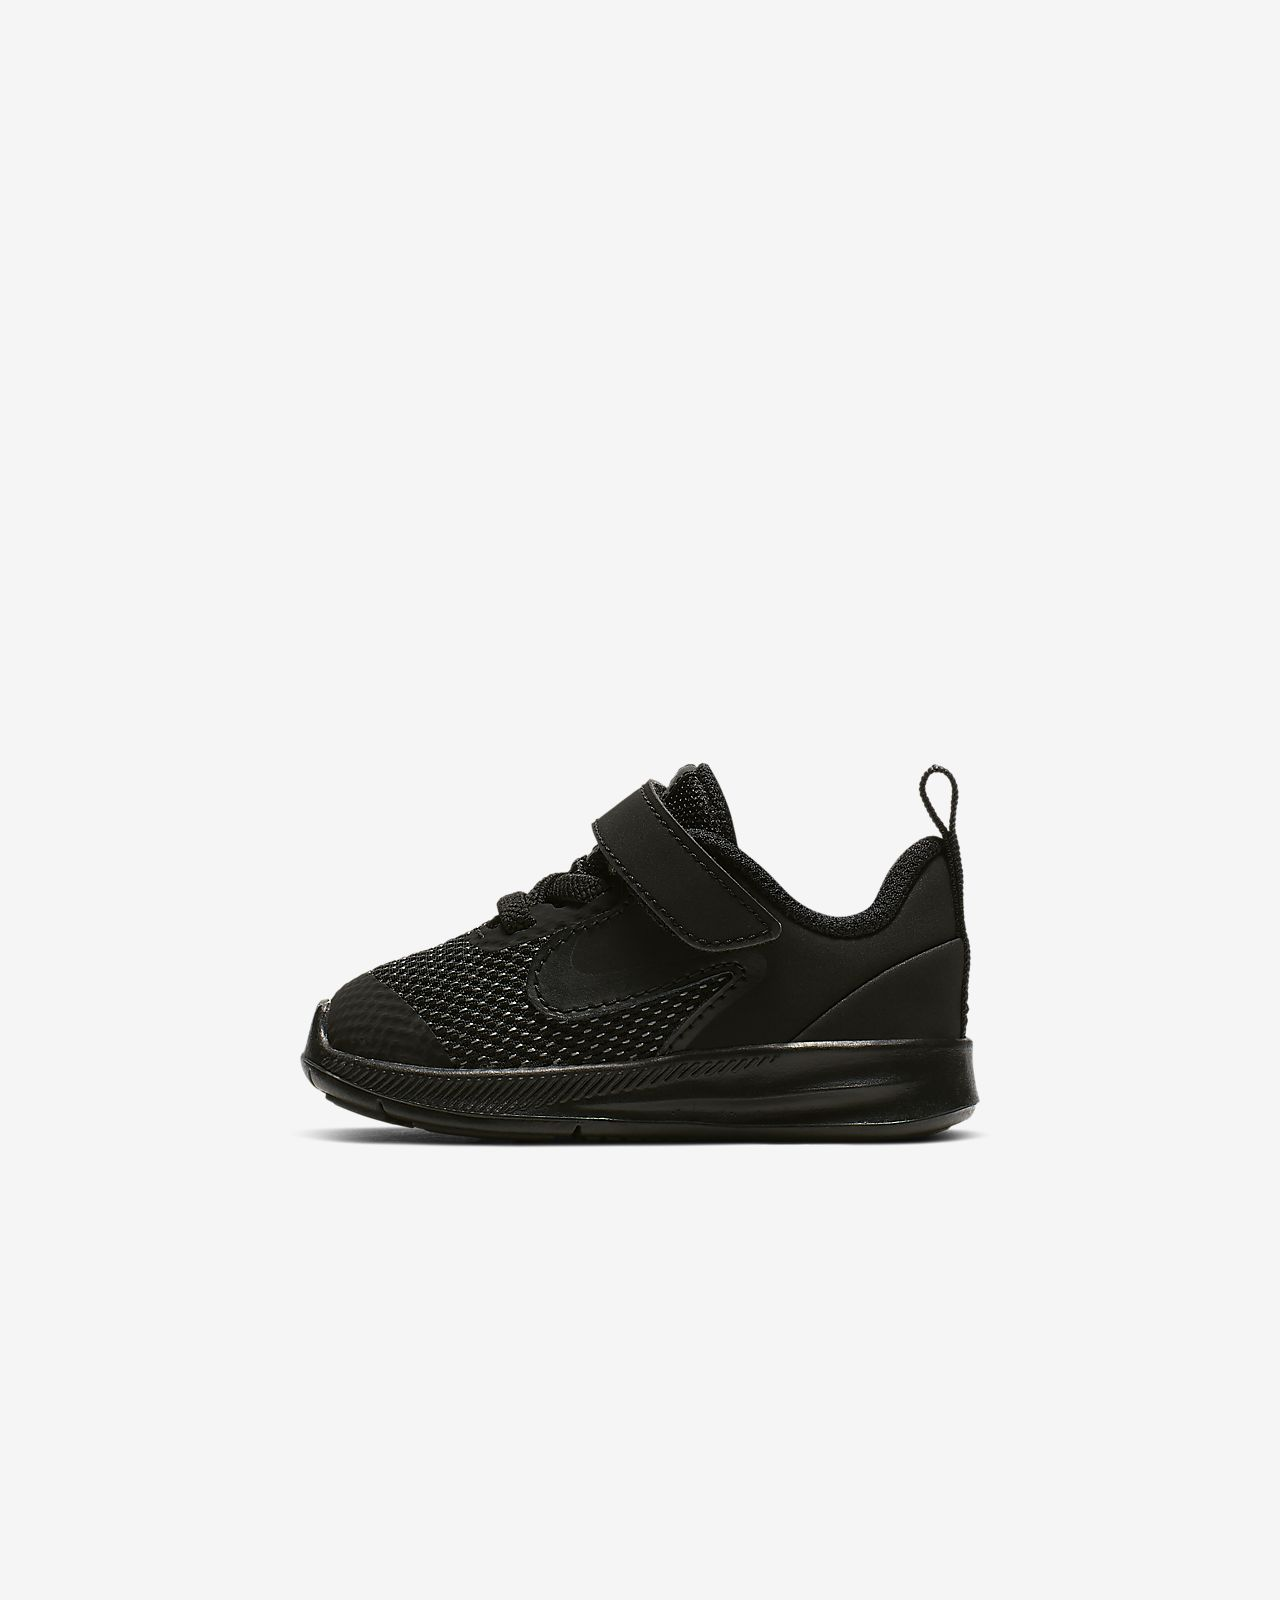 Buty dla niemowląt Nike Downshifter 9